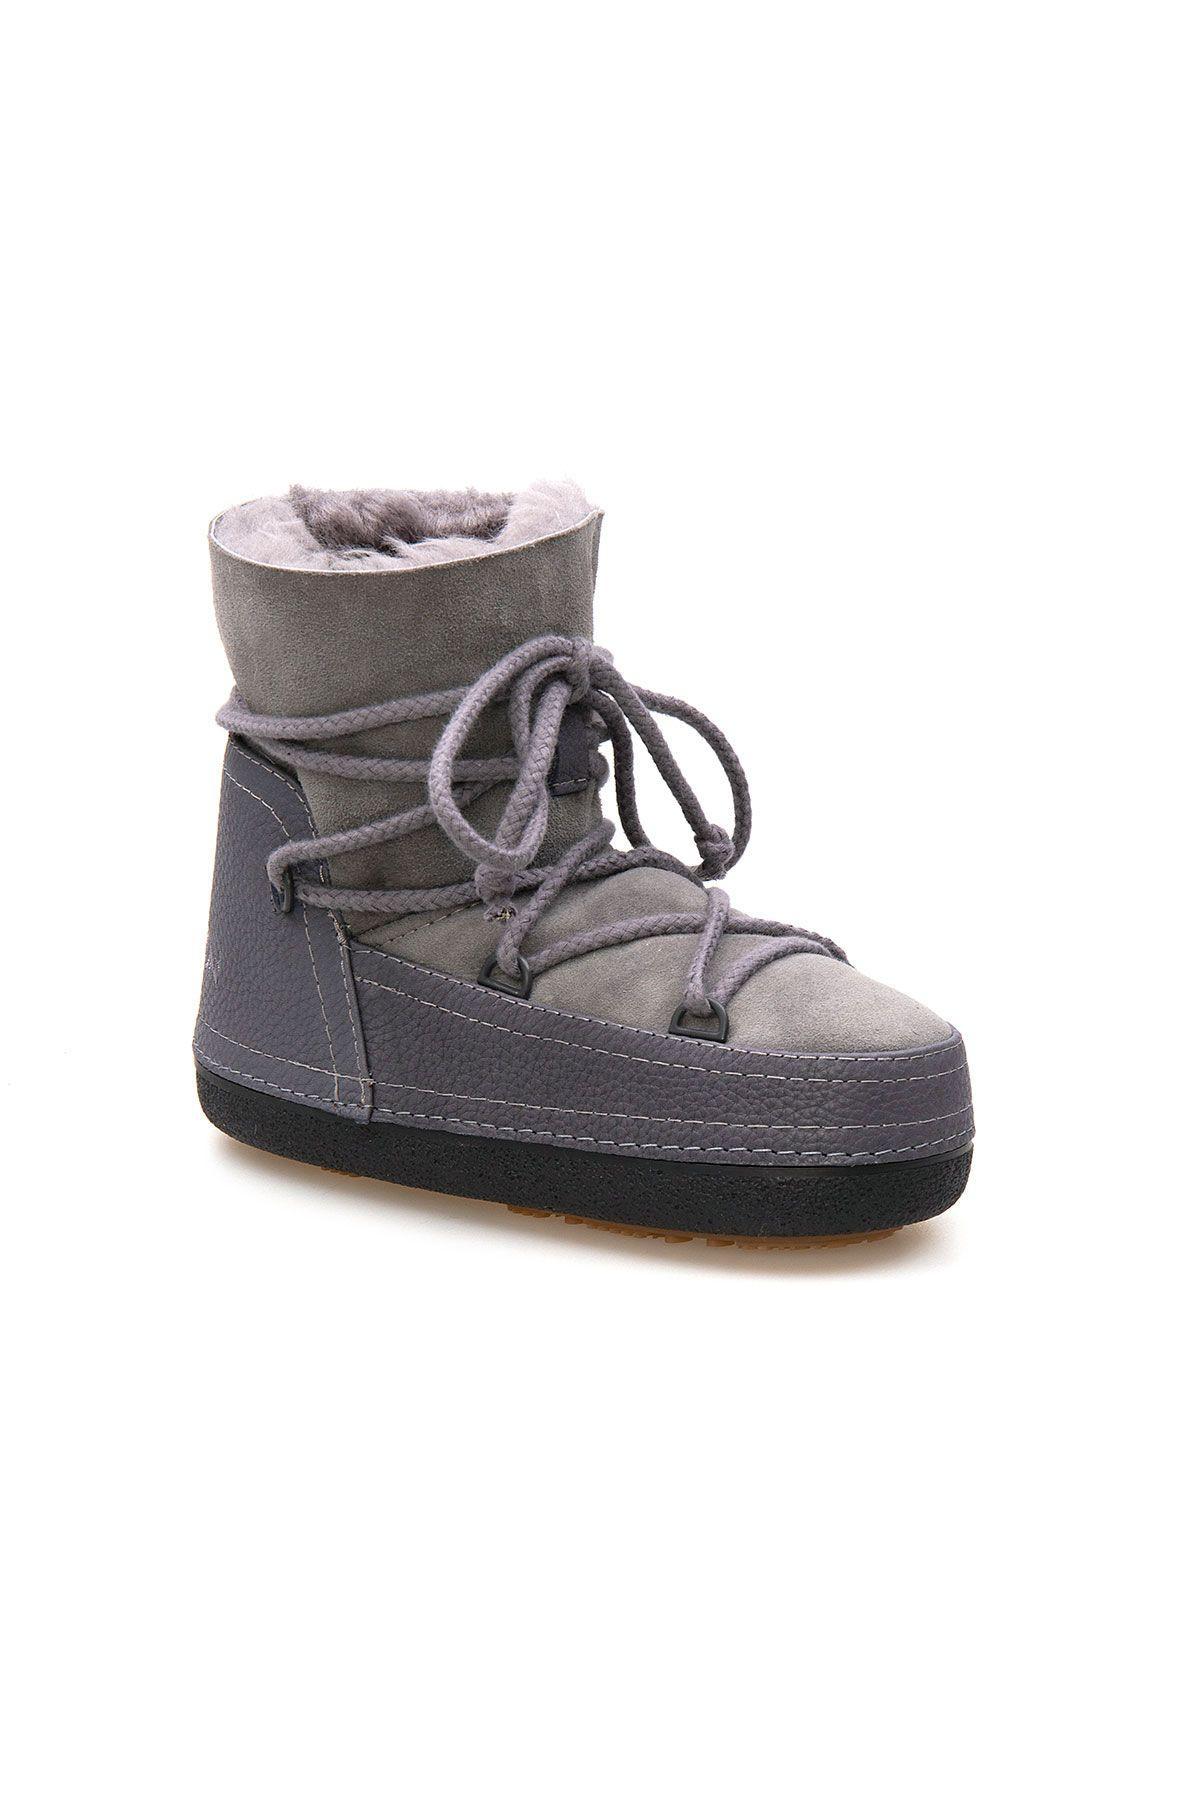 Cool Moon Genuine Sheepskin Women Snow Boots 251326 Gray